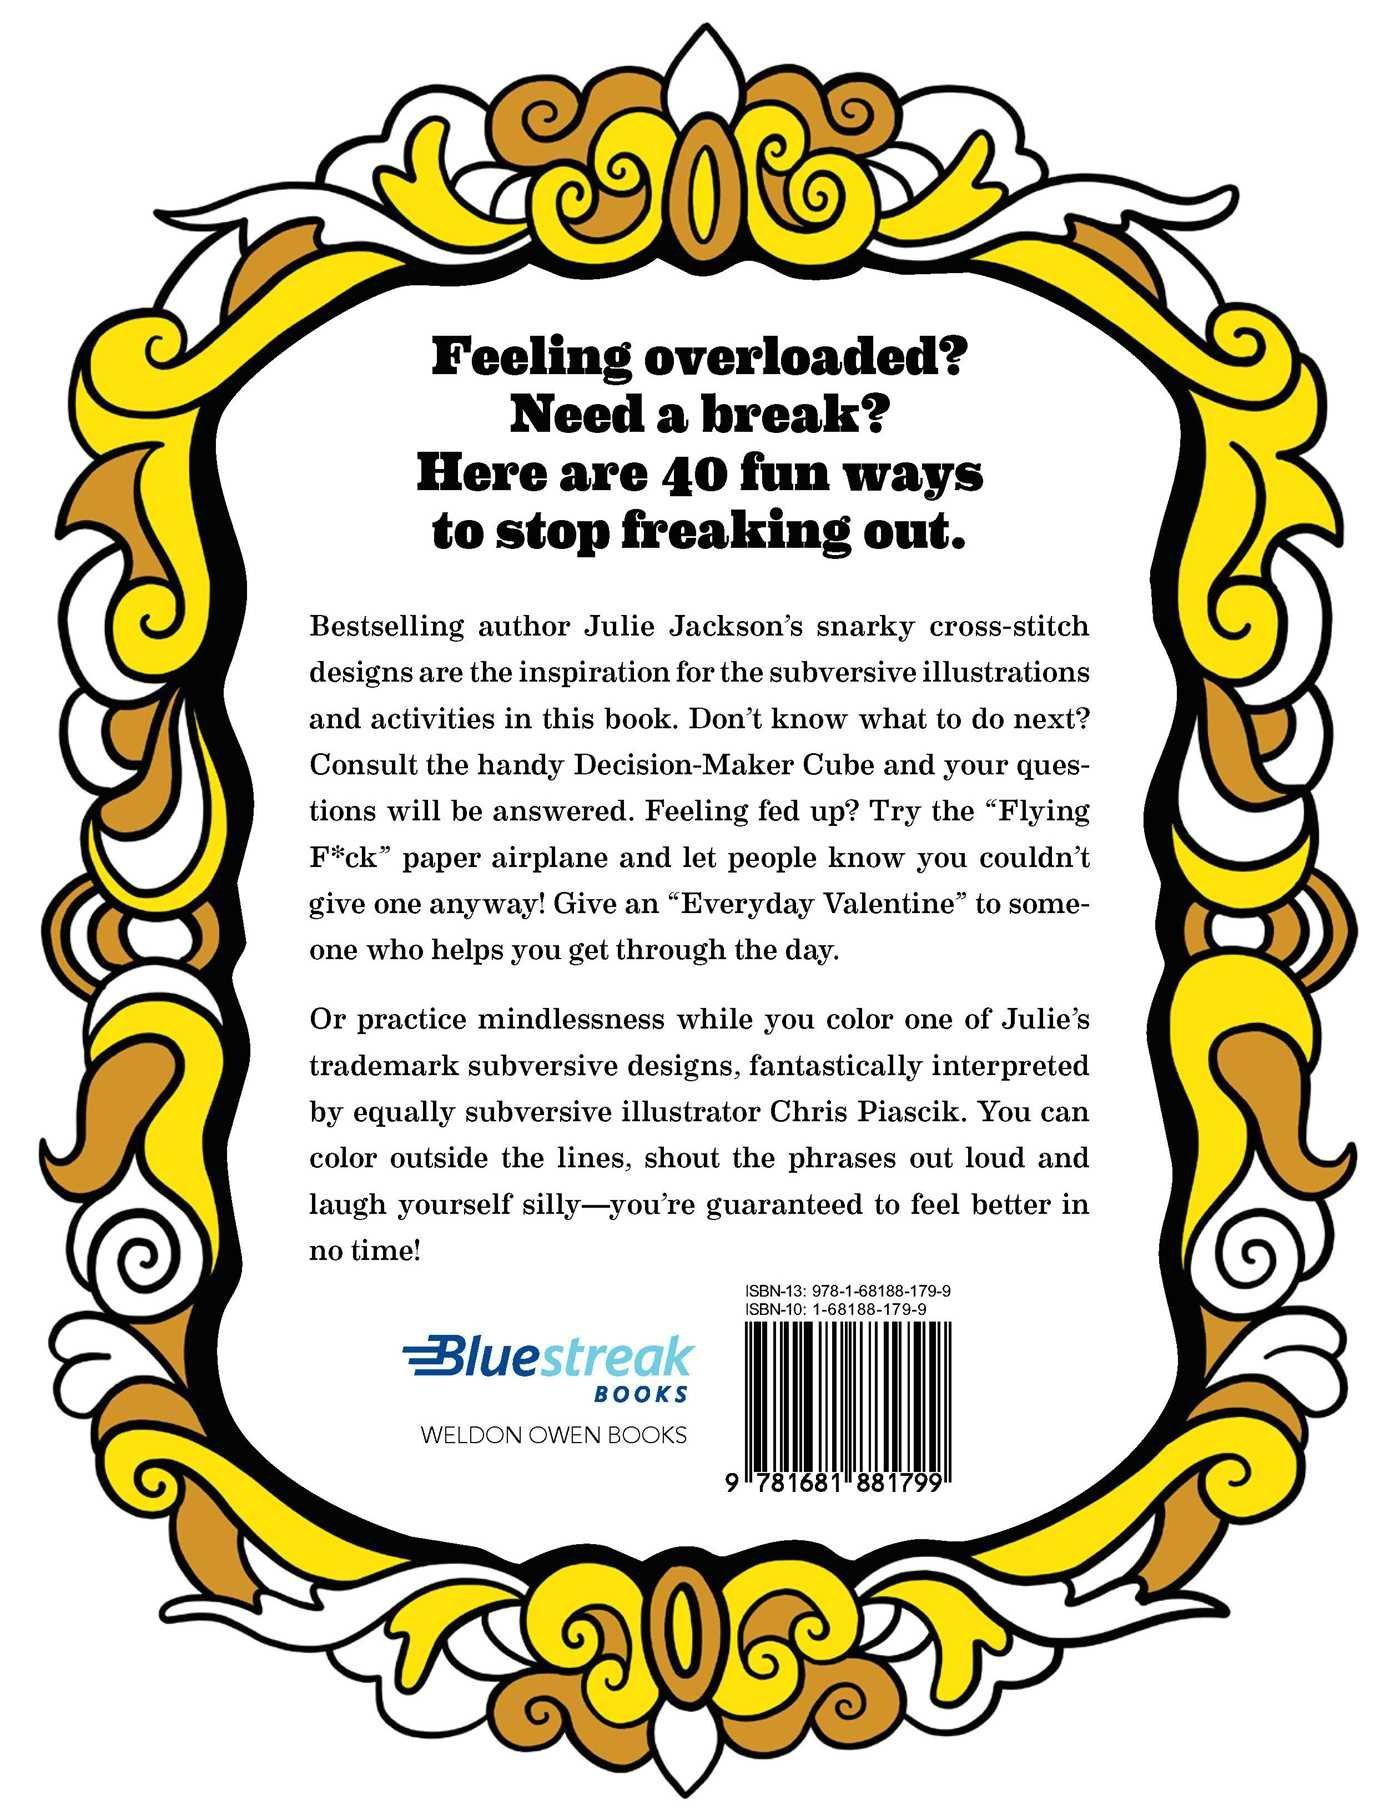 Subversive Cross Stitch Coloring And Activity Book 40 Ways To Stop Freaking Out Amazon De Jackson Julie Fremdsprachige Bucher